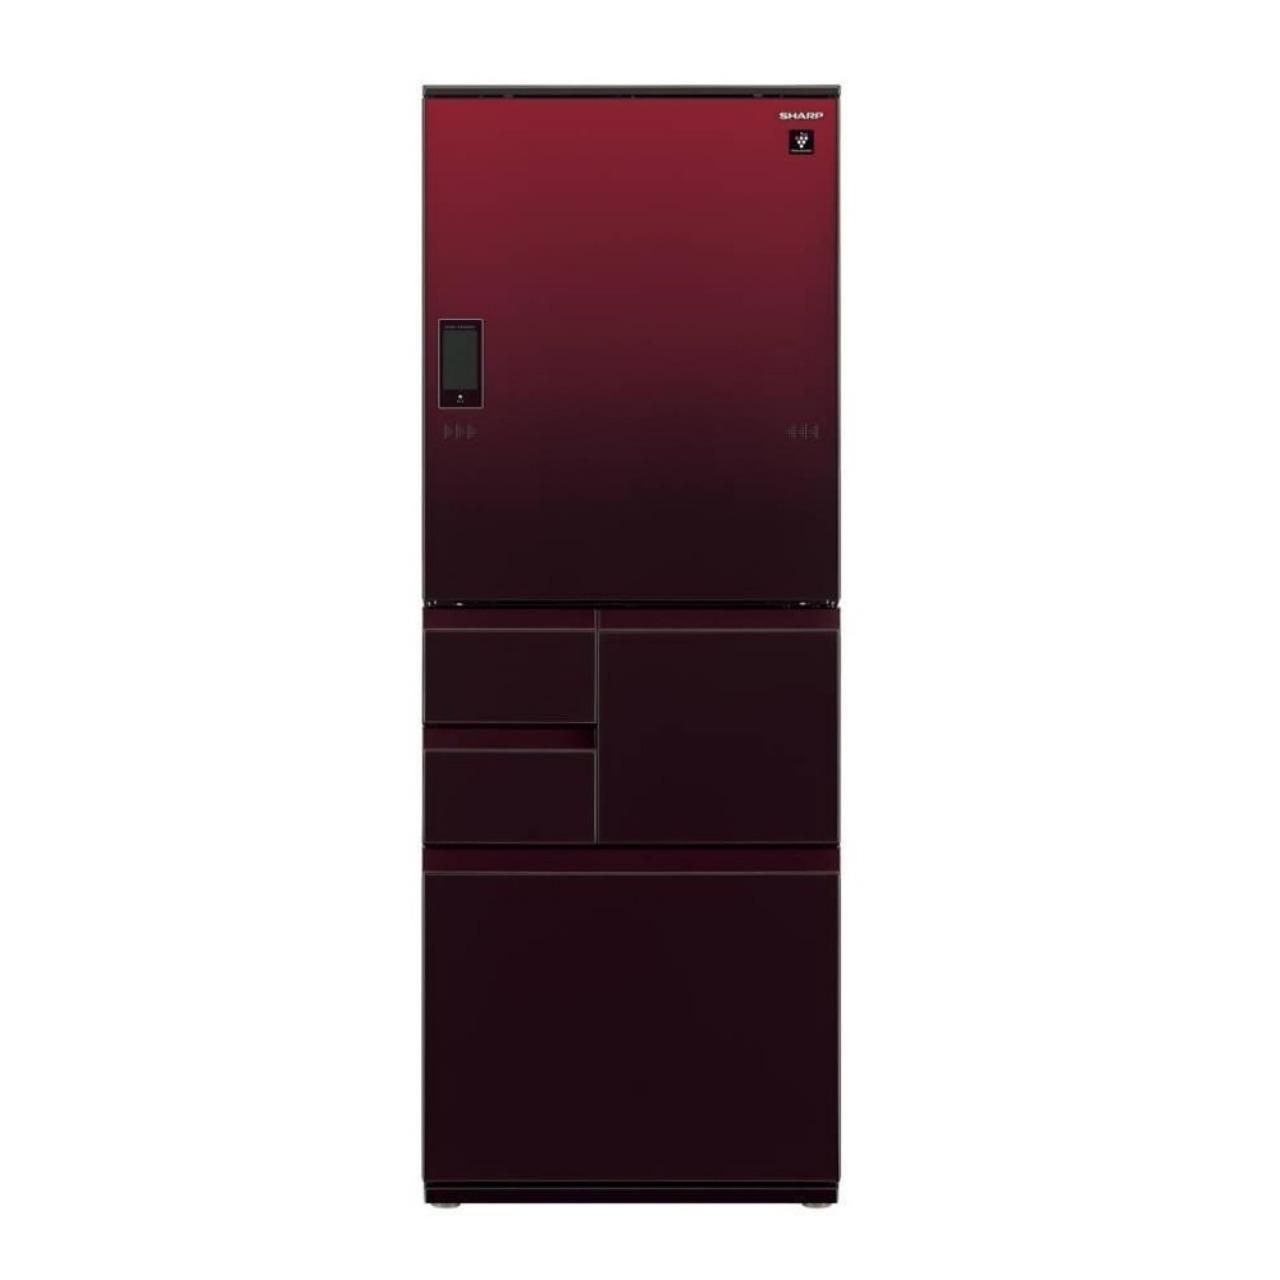 シャープSJ-GW36D冷蔵庫